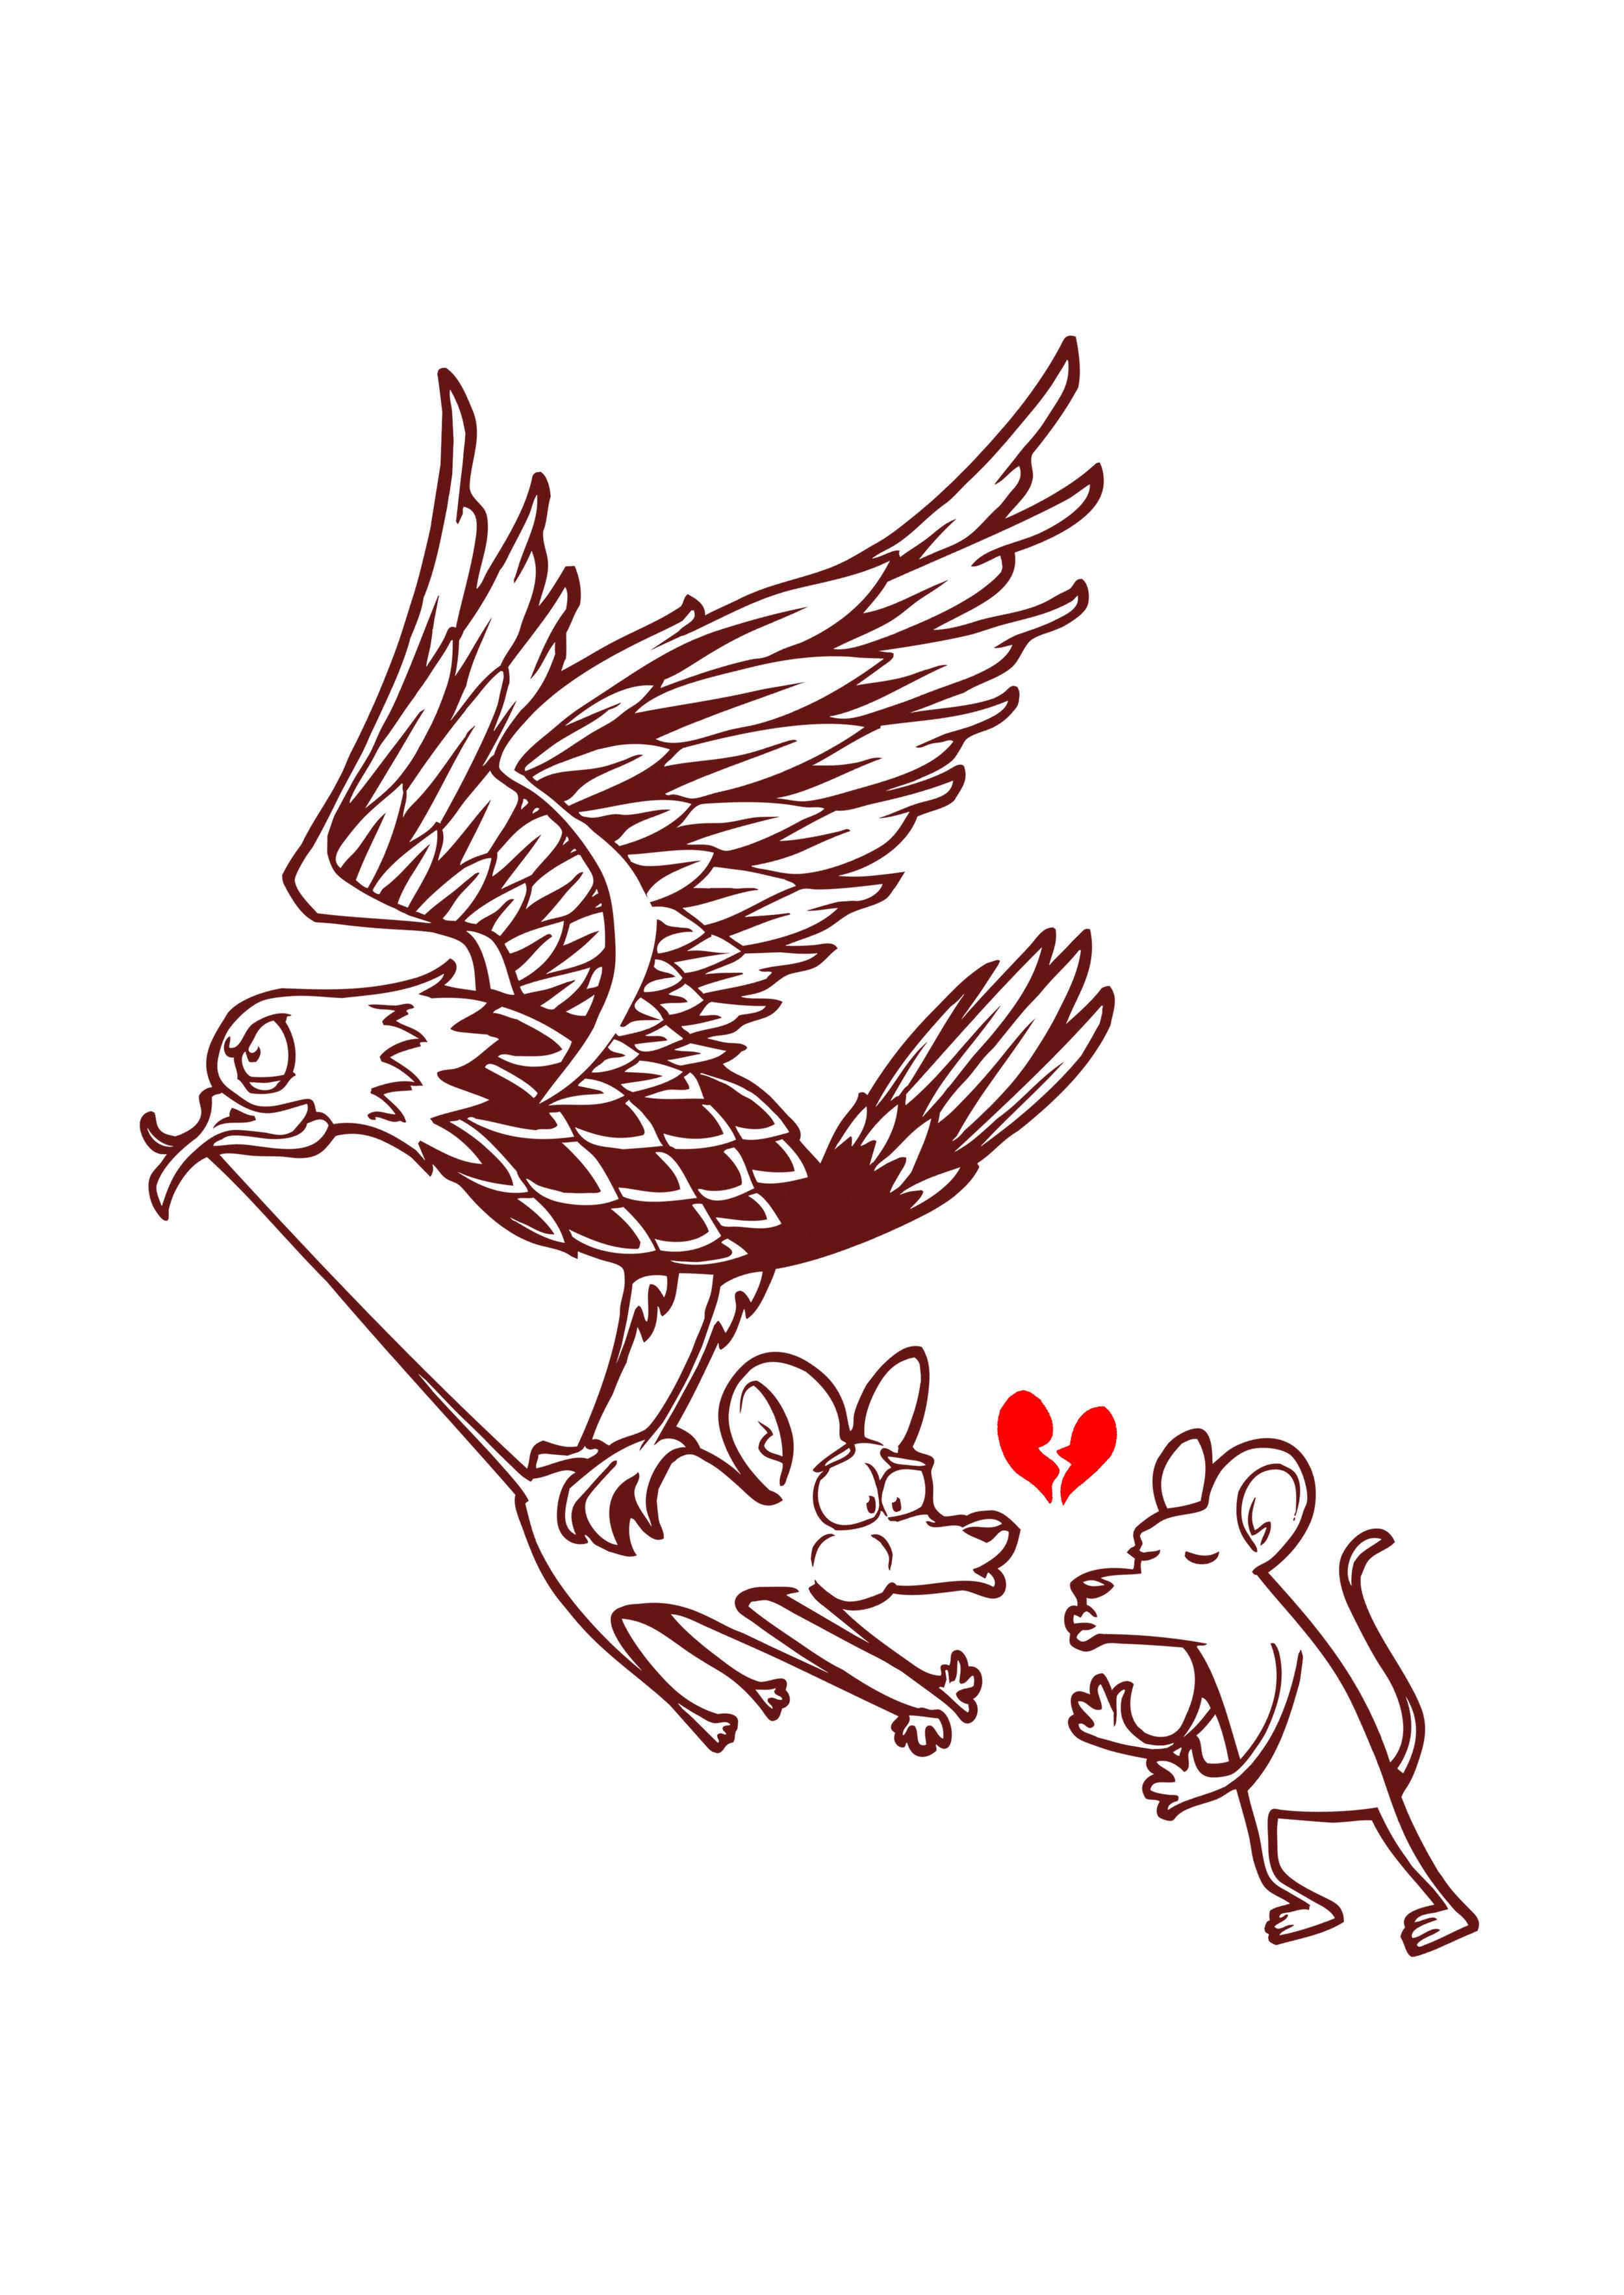 eagleheart.jpg